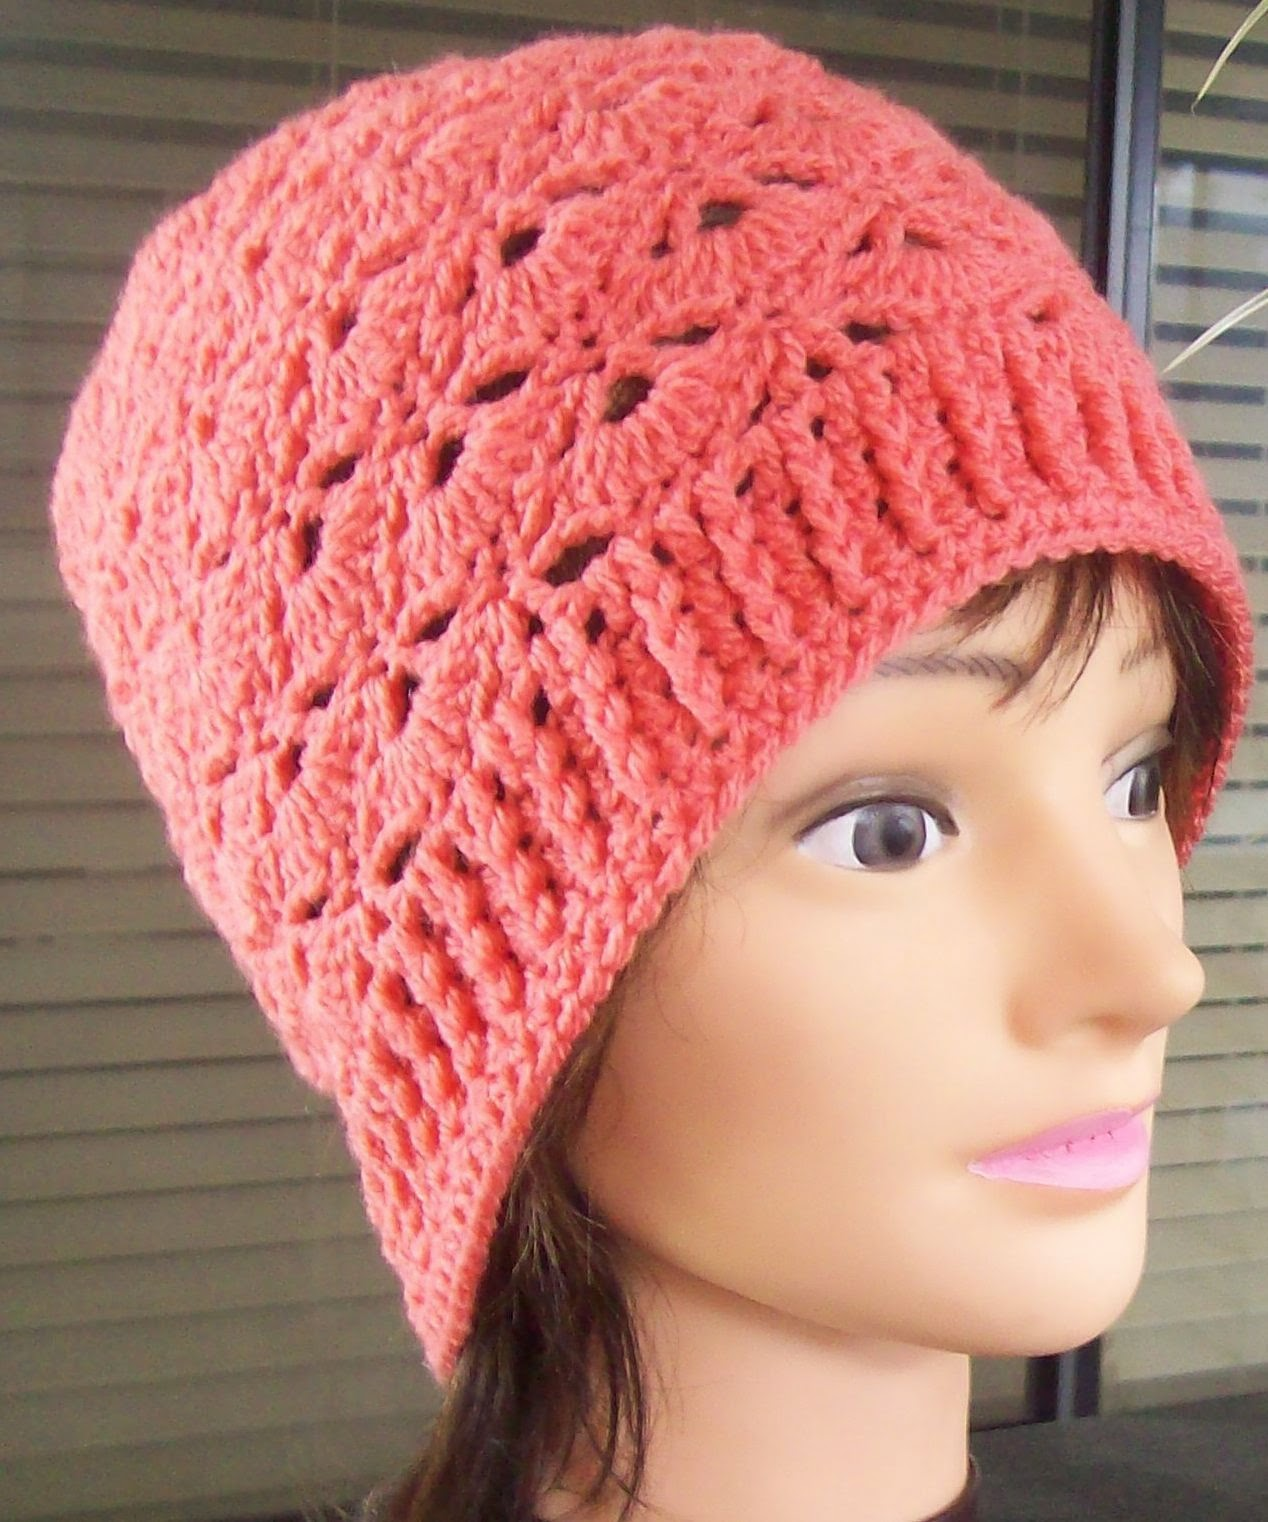 Free Knitting Patterns For Adults Hats : Free Crochet Patterns By Cats-Rockin-Crochet